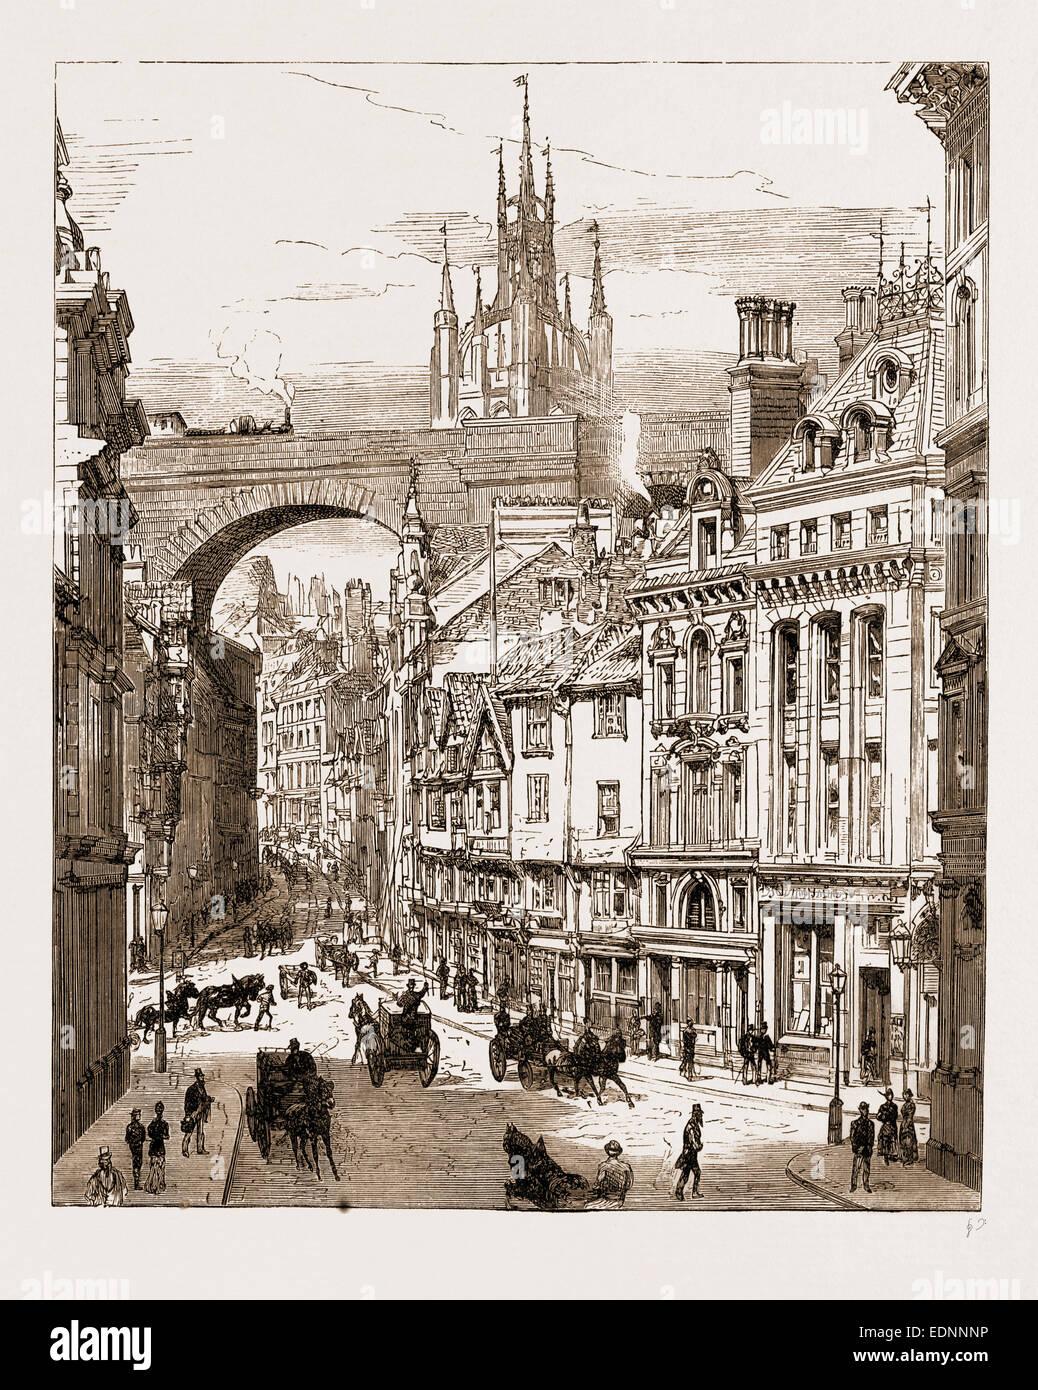 NEWCASTLE, UK, 1881: DEAN STREET - Stock Image